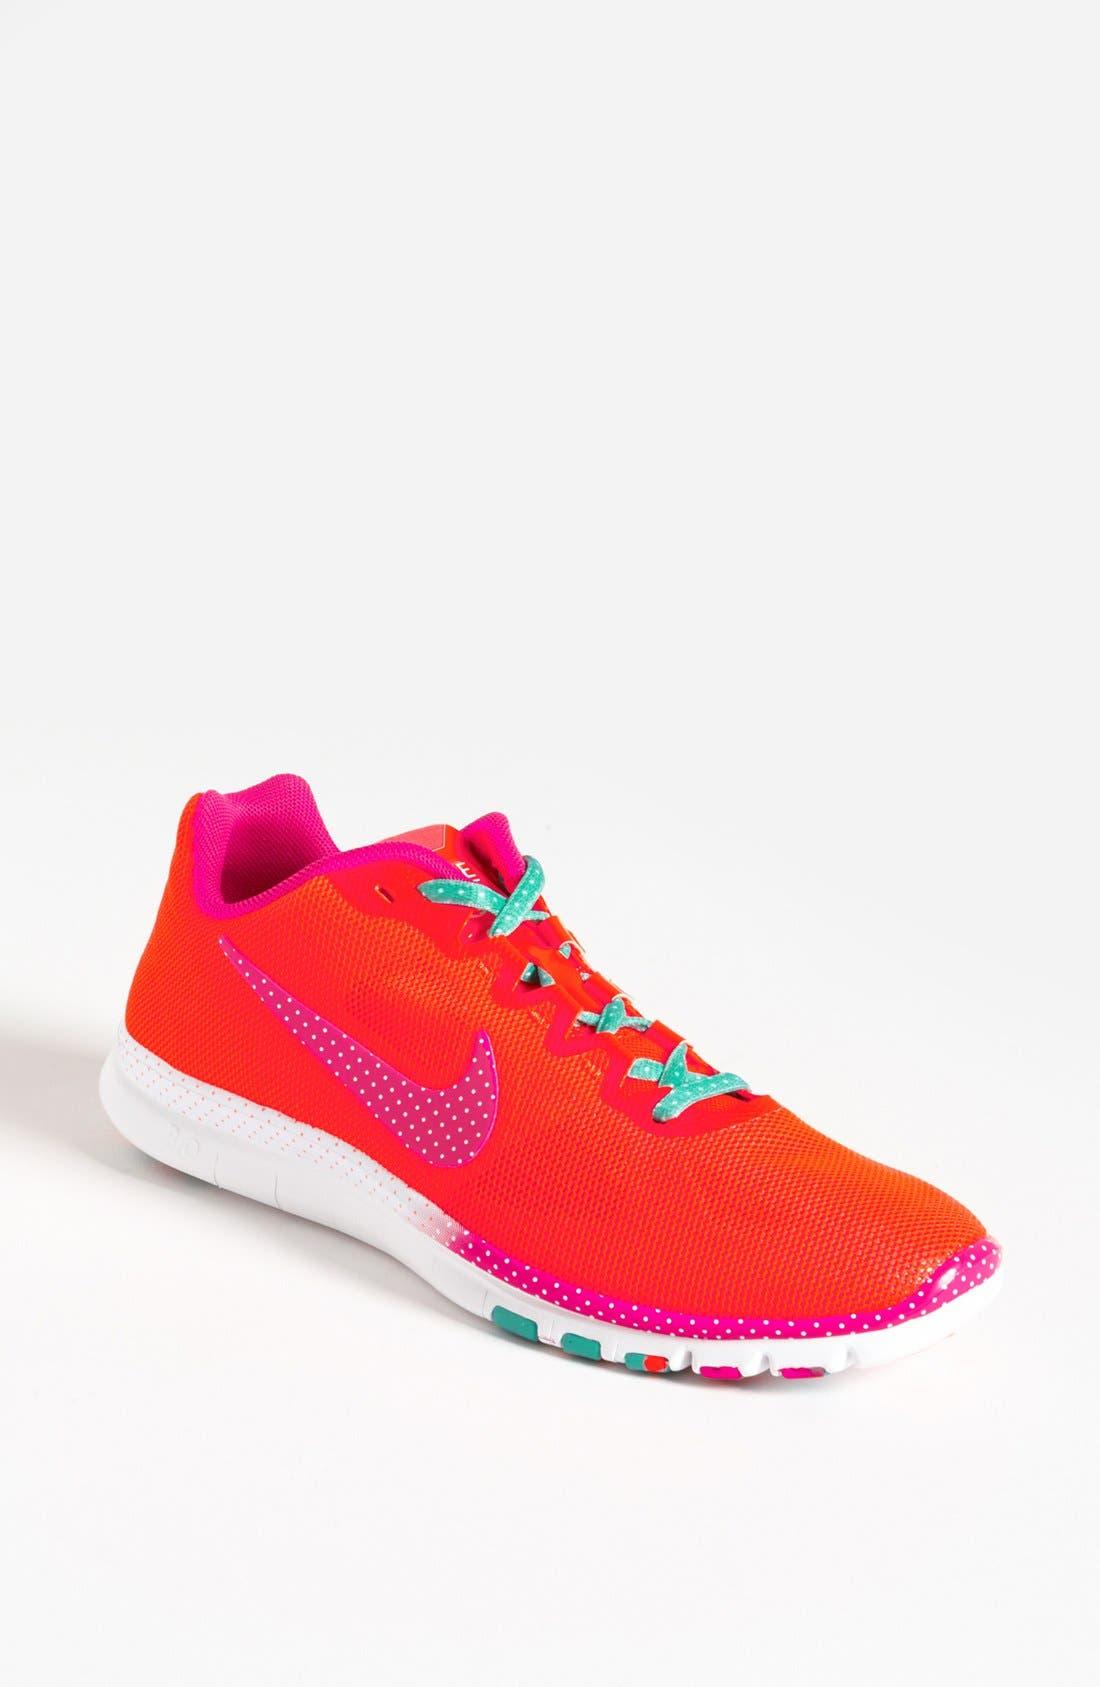 Main Image - Nike 'Free Advantage 3.0' Training Shoe (Women)